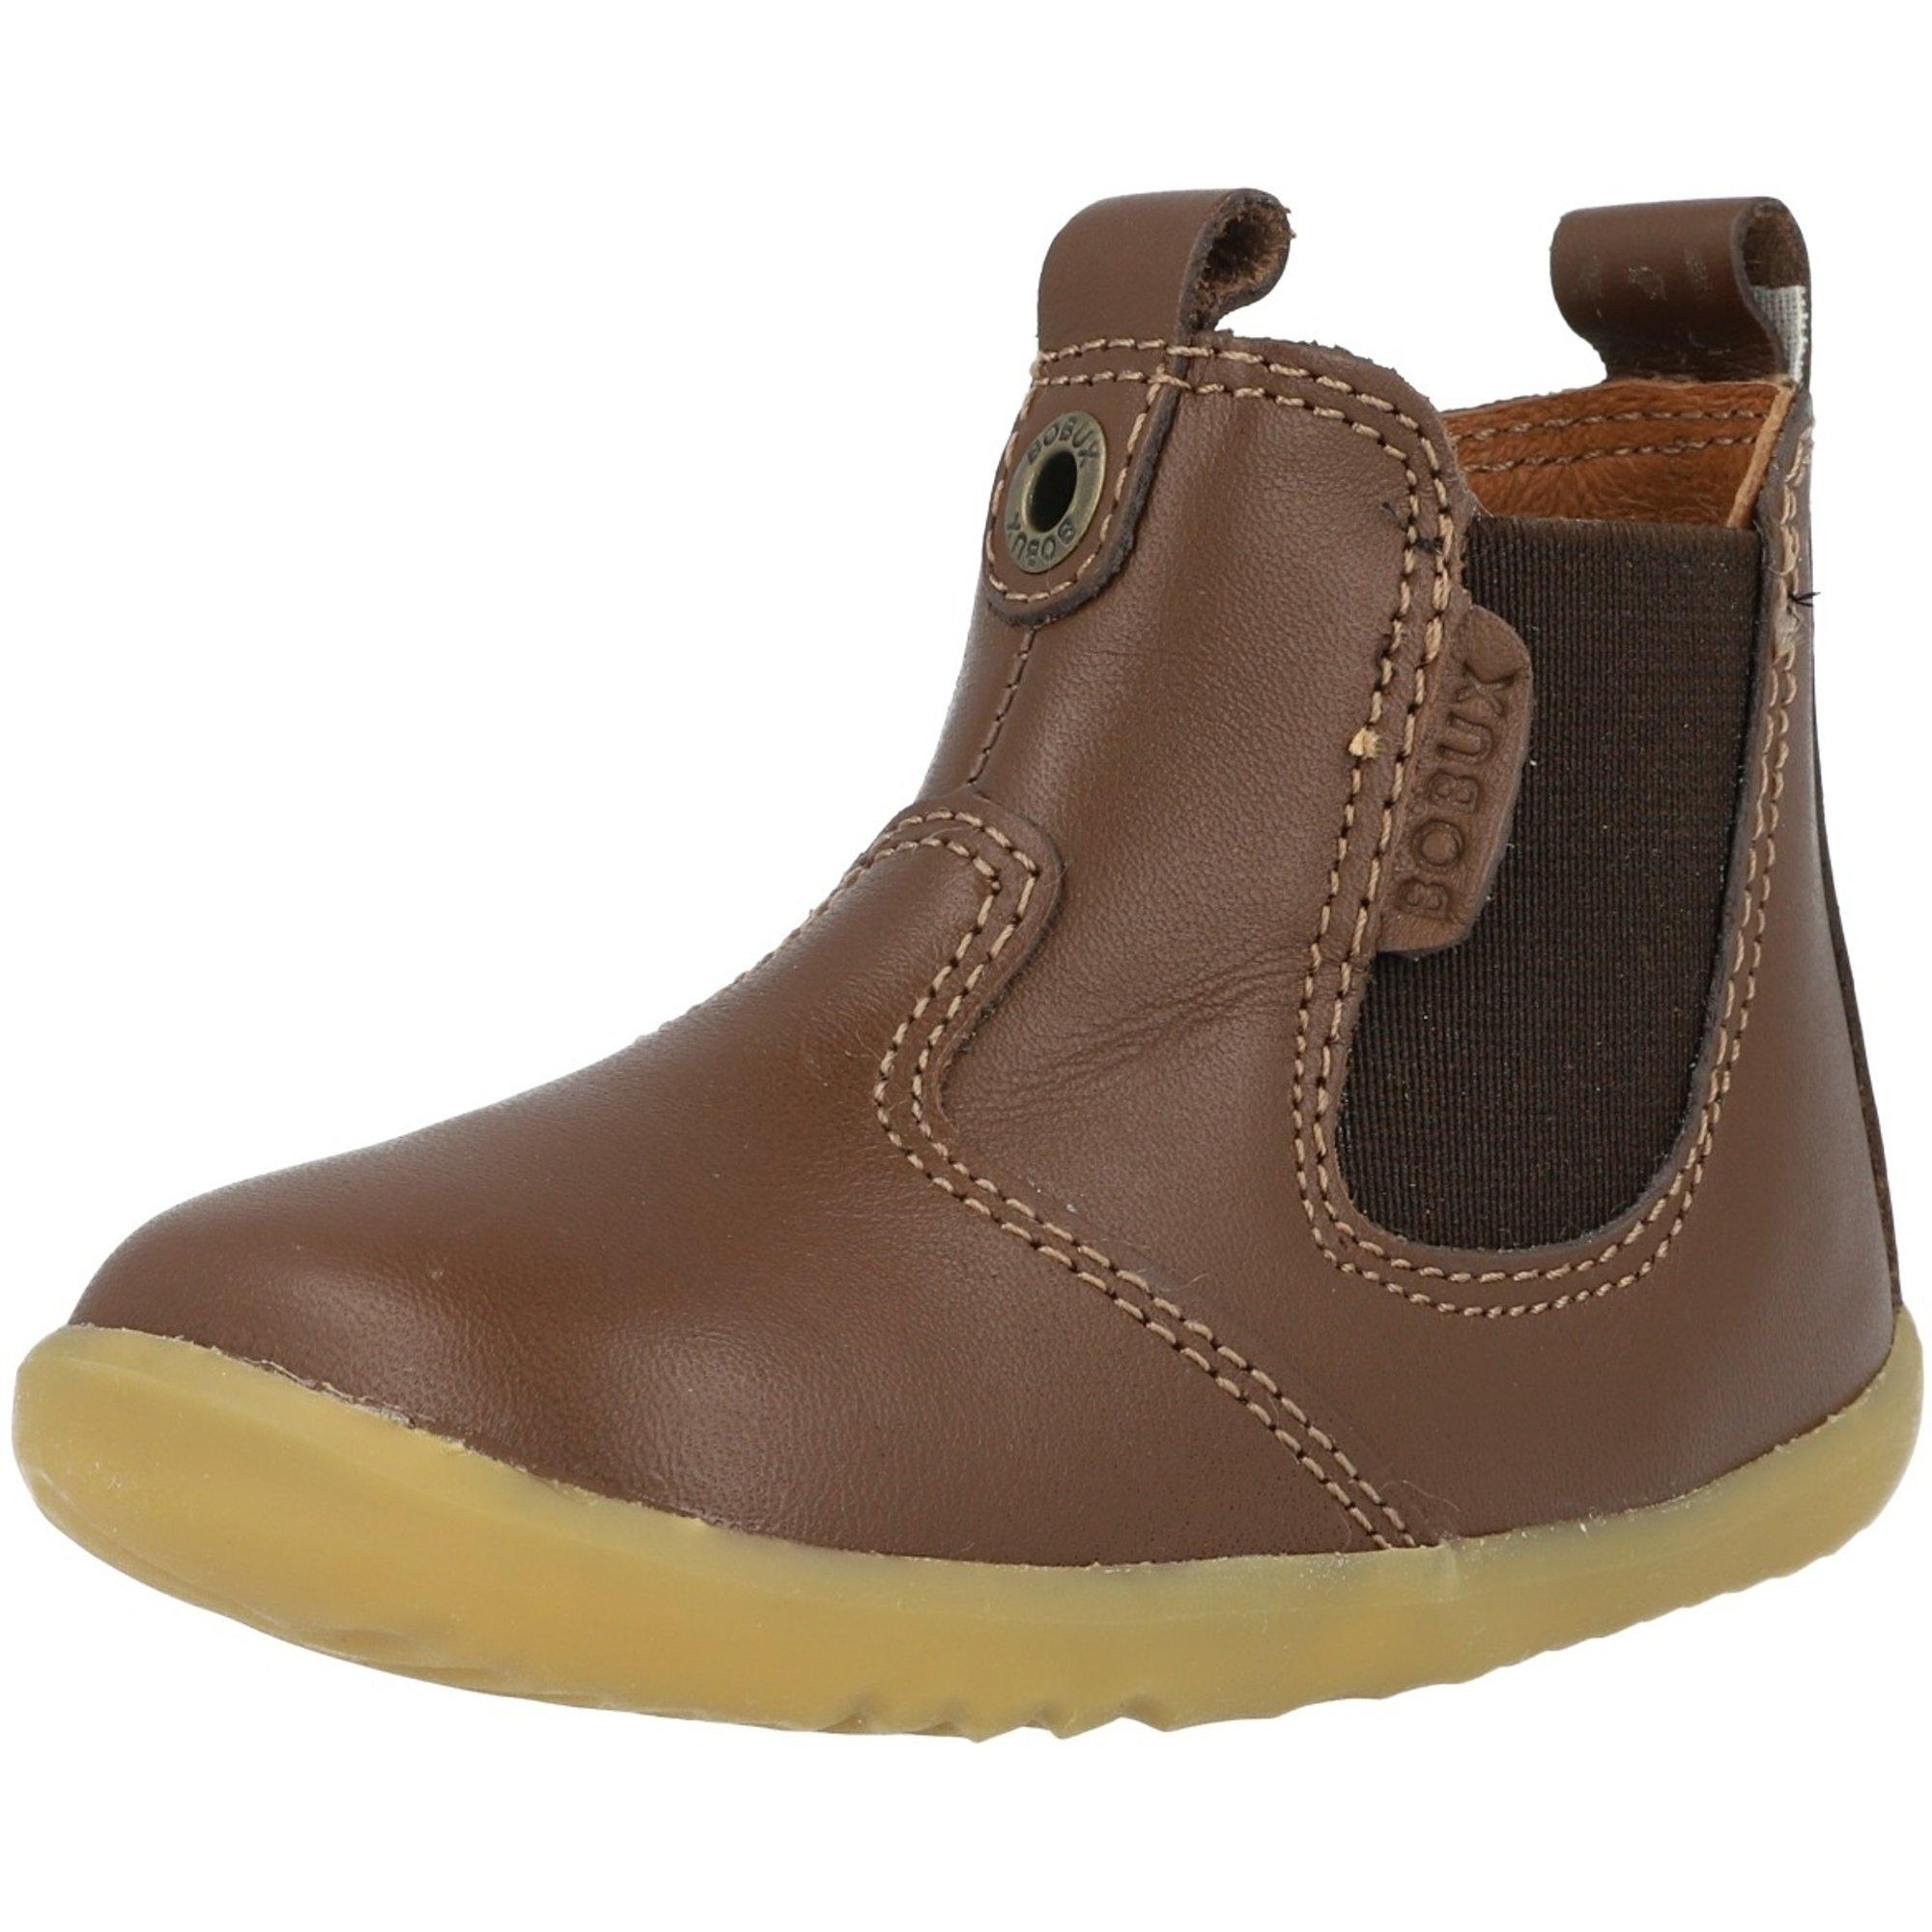 Bobux Step Up Jodhpur Toffee Leather